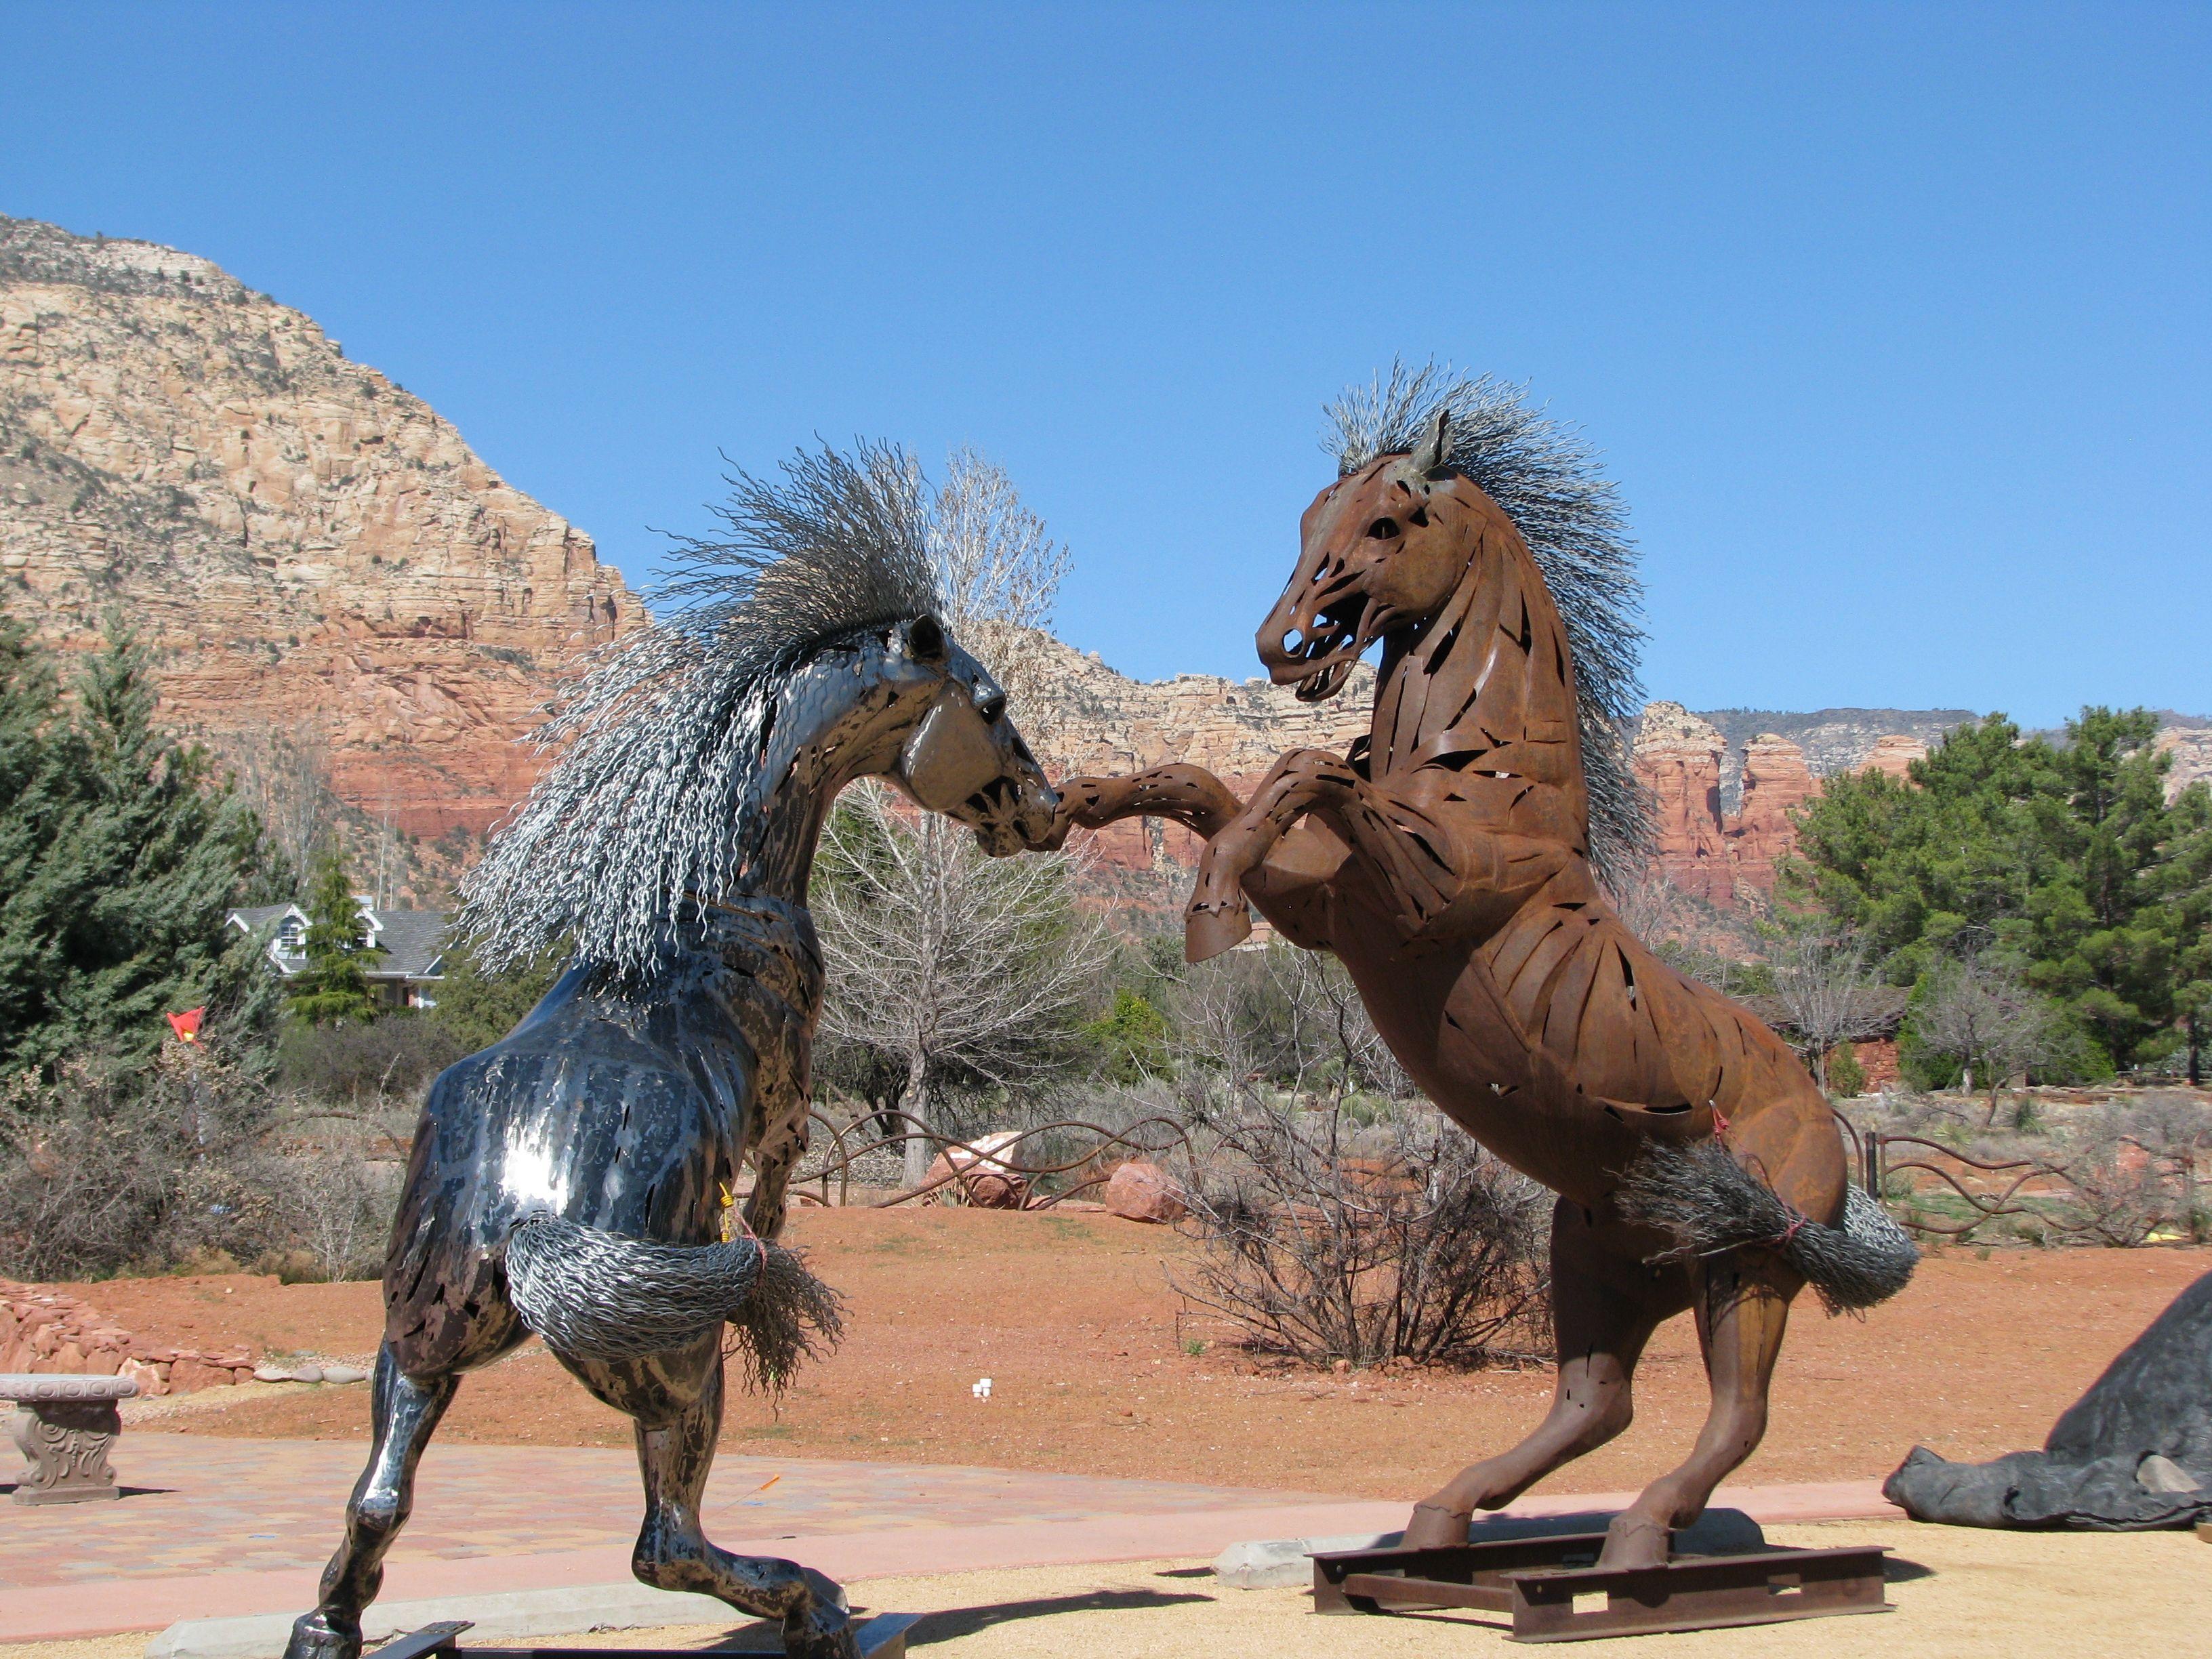 At the goldenstein gallery in sedona az horse